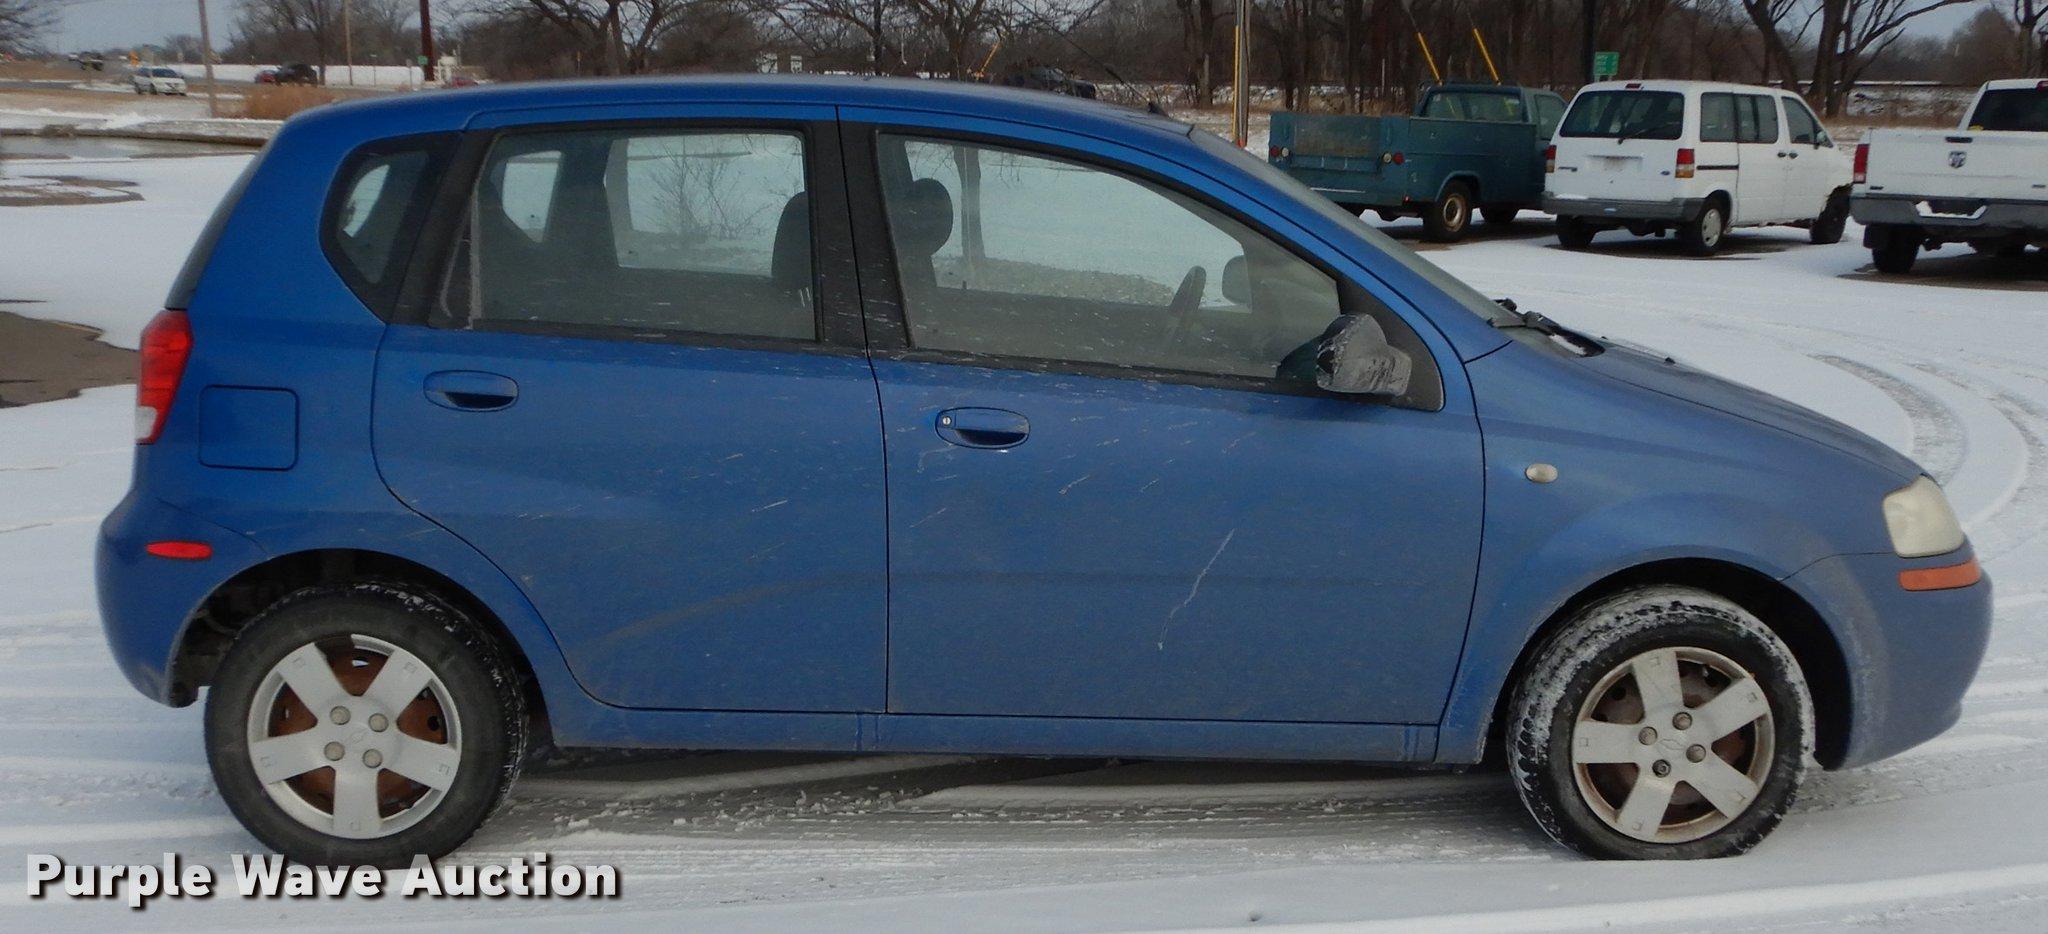 Chevrolet chevrolet 2006 aveo : 2006 Chevrolet Aveo LS   Item DC0253   SOLD! February 21 Veh...